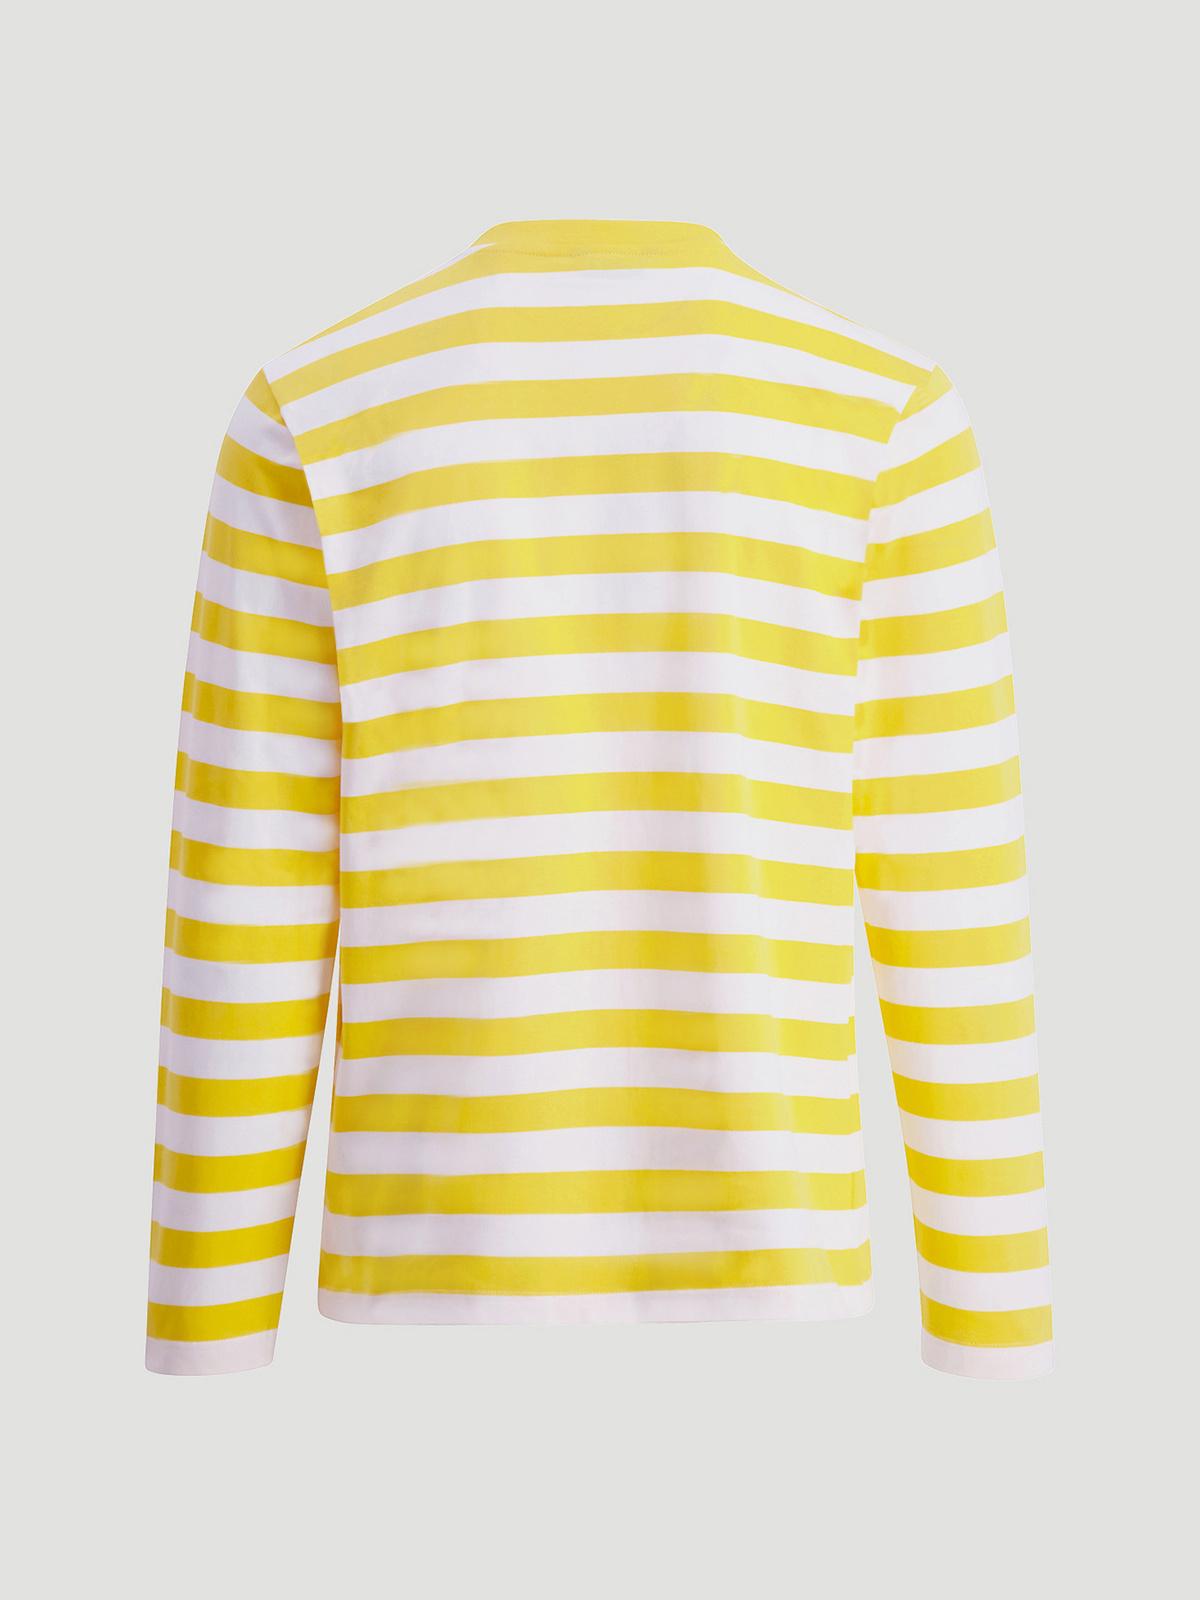 Hanger Striped Longsleeve Yellow White 2